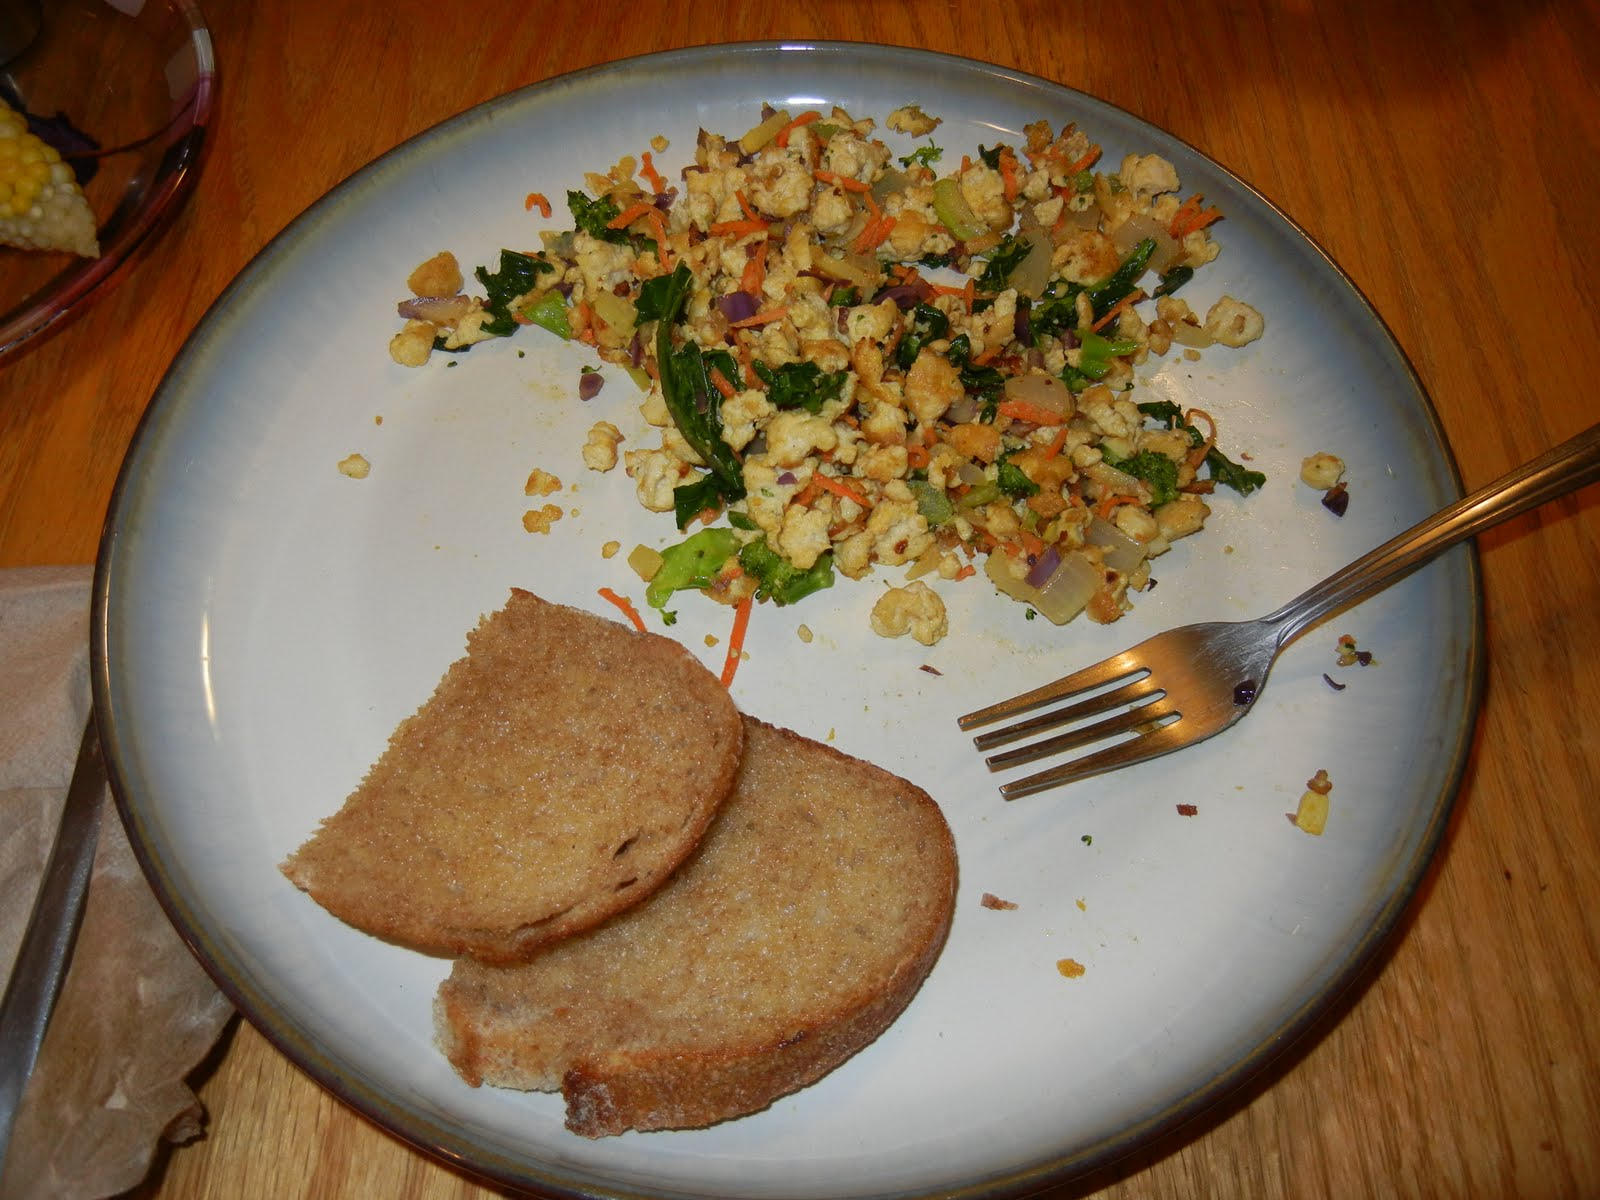 Mimi S Cafe Vegan Breakfast